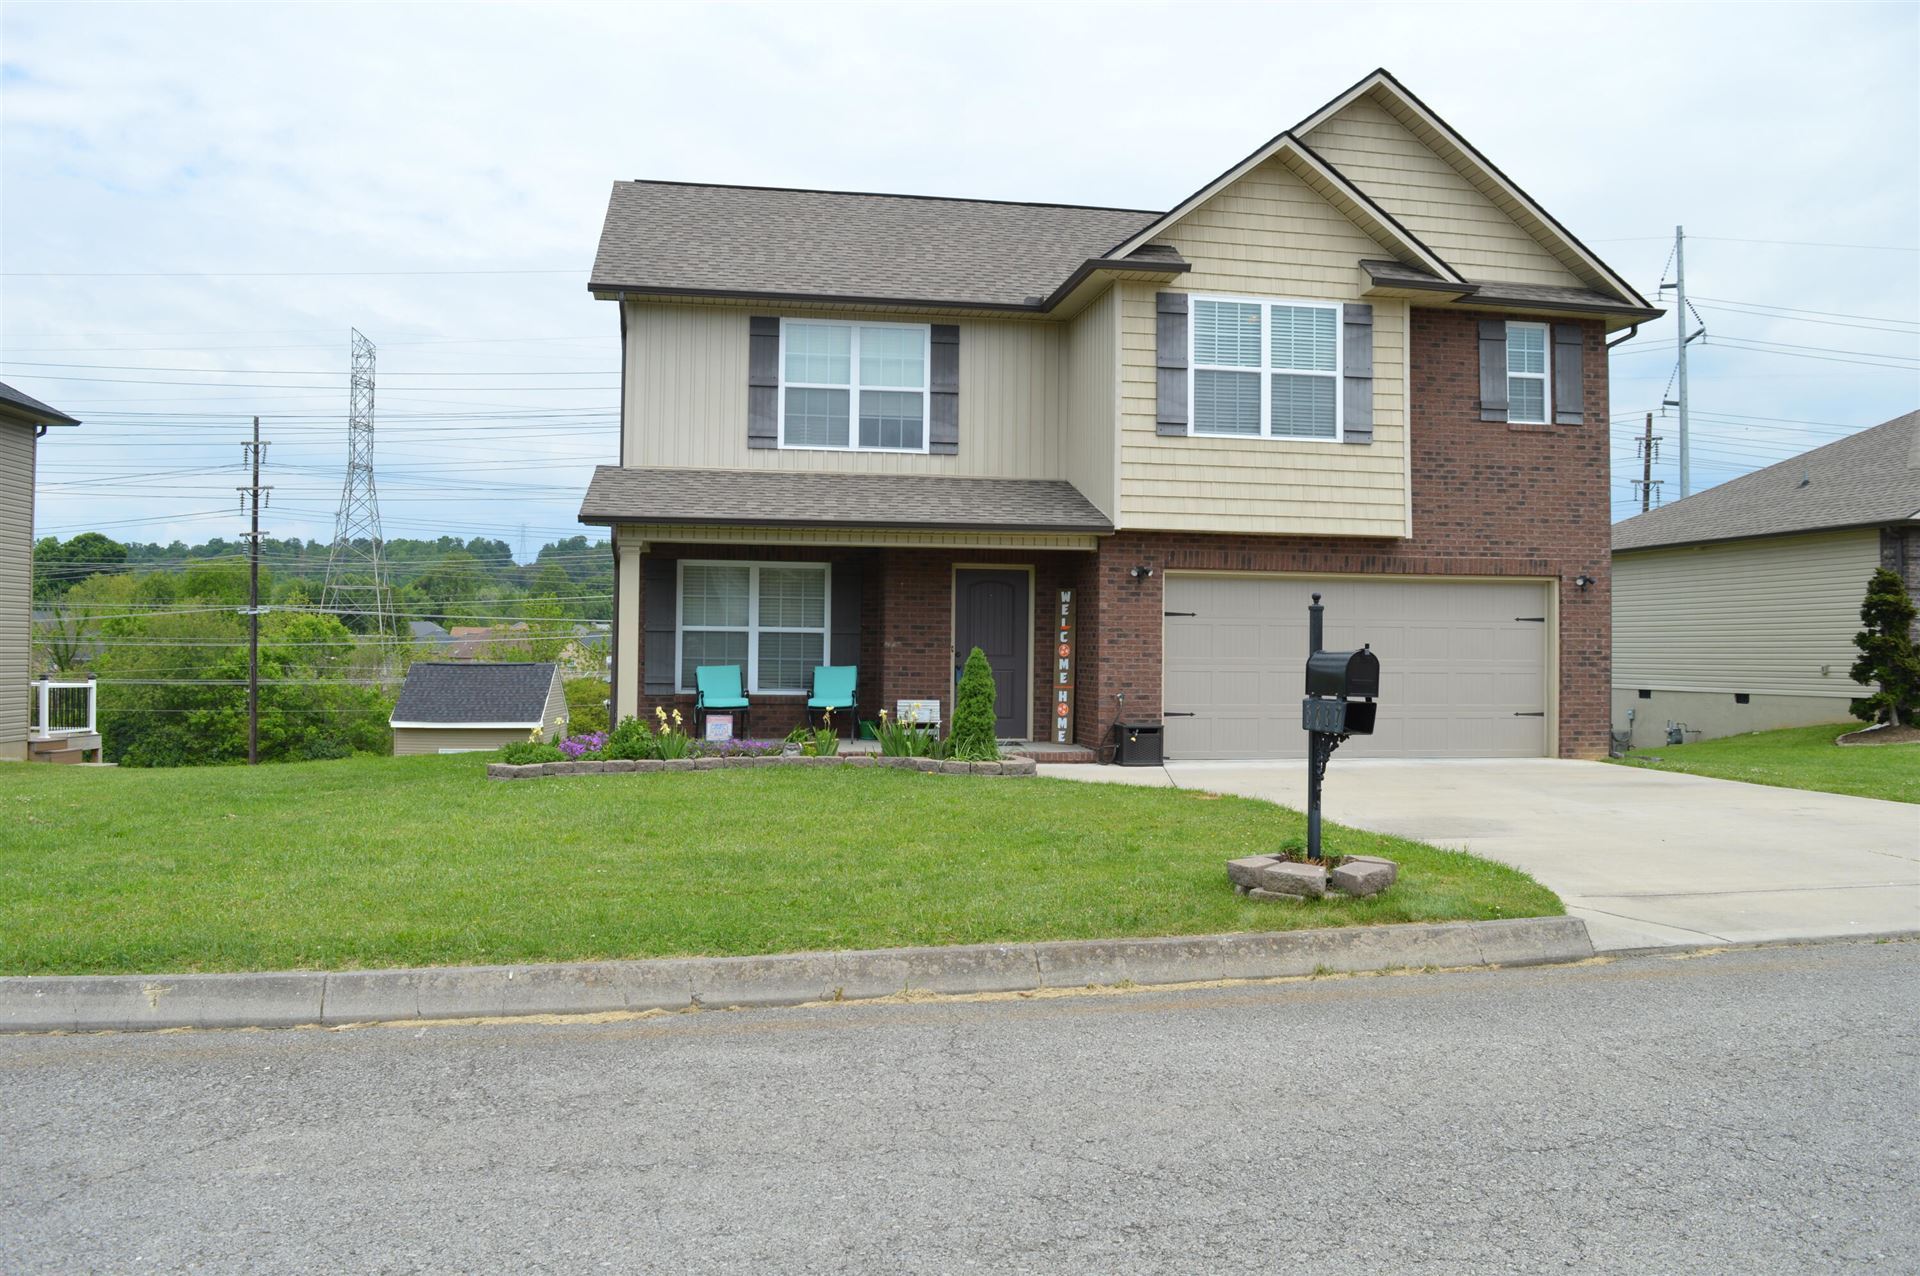 Photo of 5637 Autumn Creek Drive, Knoxville, TN 37924 (MLS # 1153387)